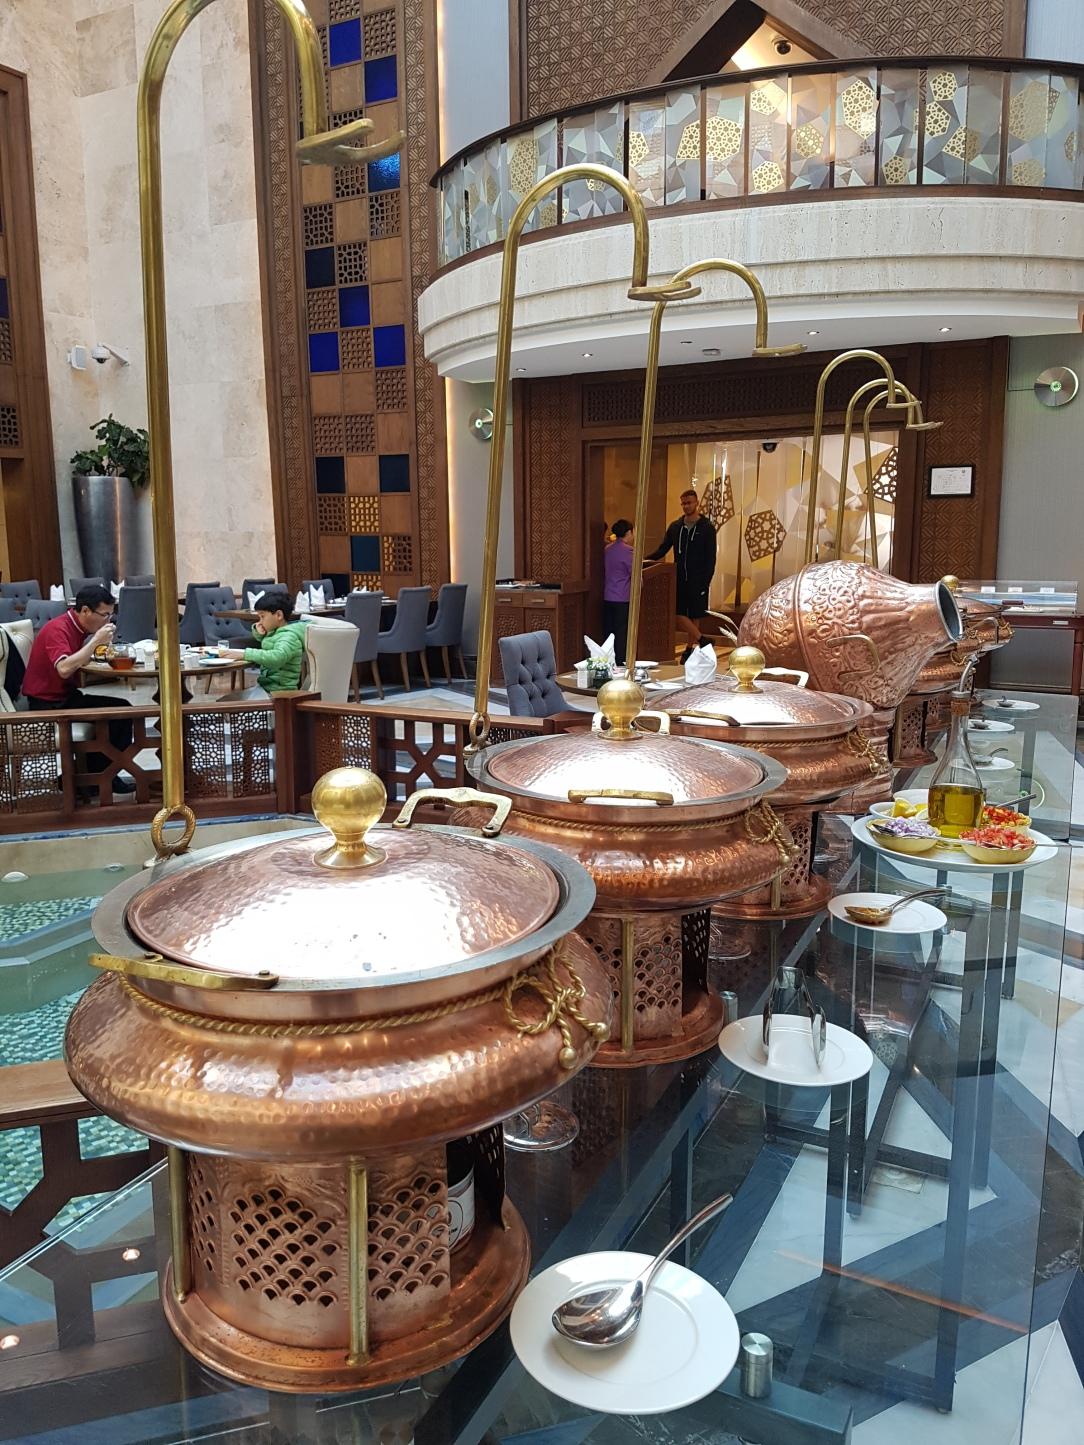 2-Day Getaway by Souq Waqif Boutique Hotels – www